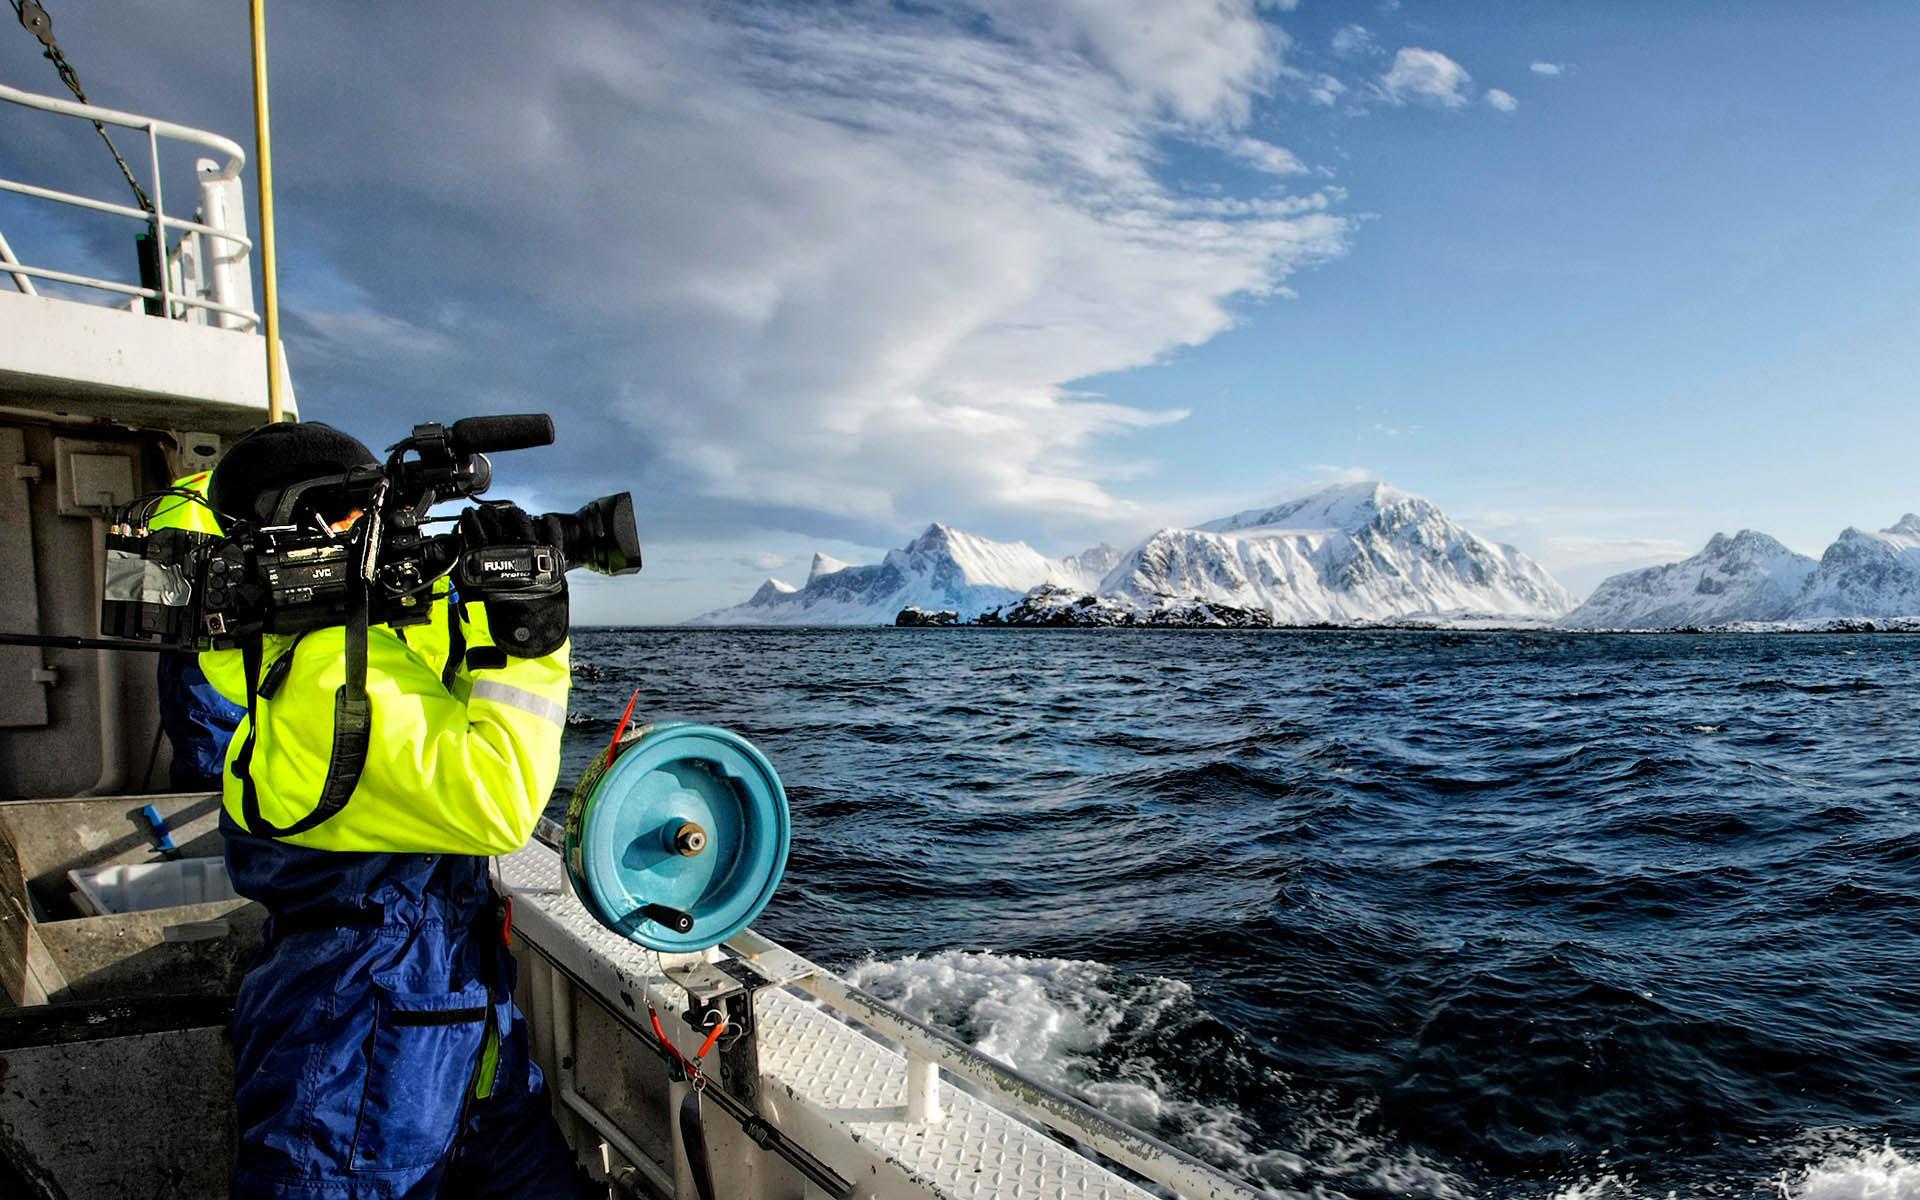 lofoten-islands-fishing-show-filming-photo-by-kent-miklenda-1920x1200.jpg